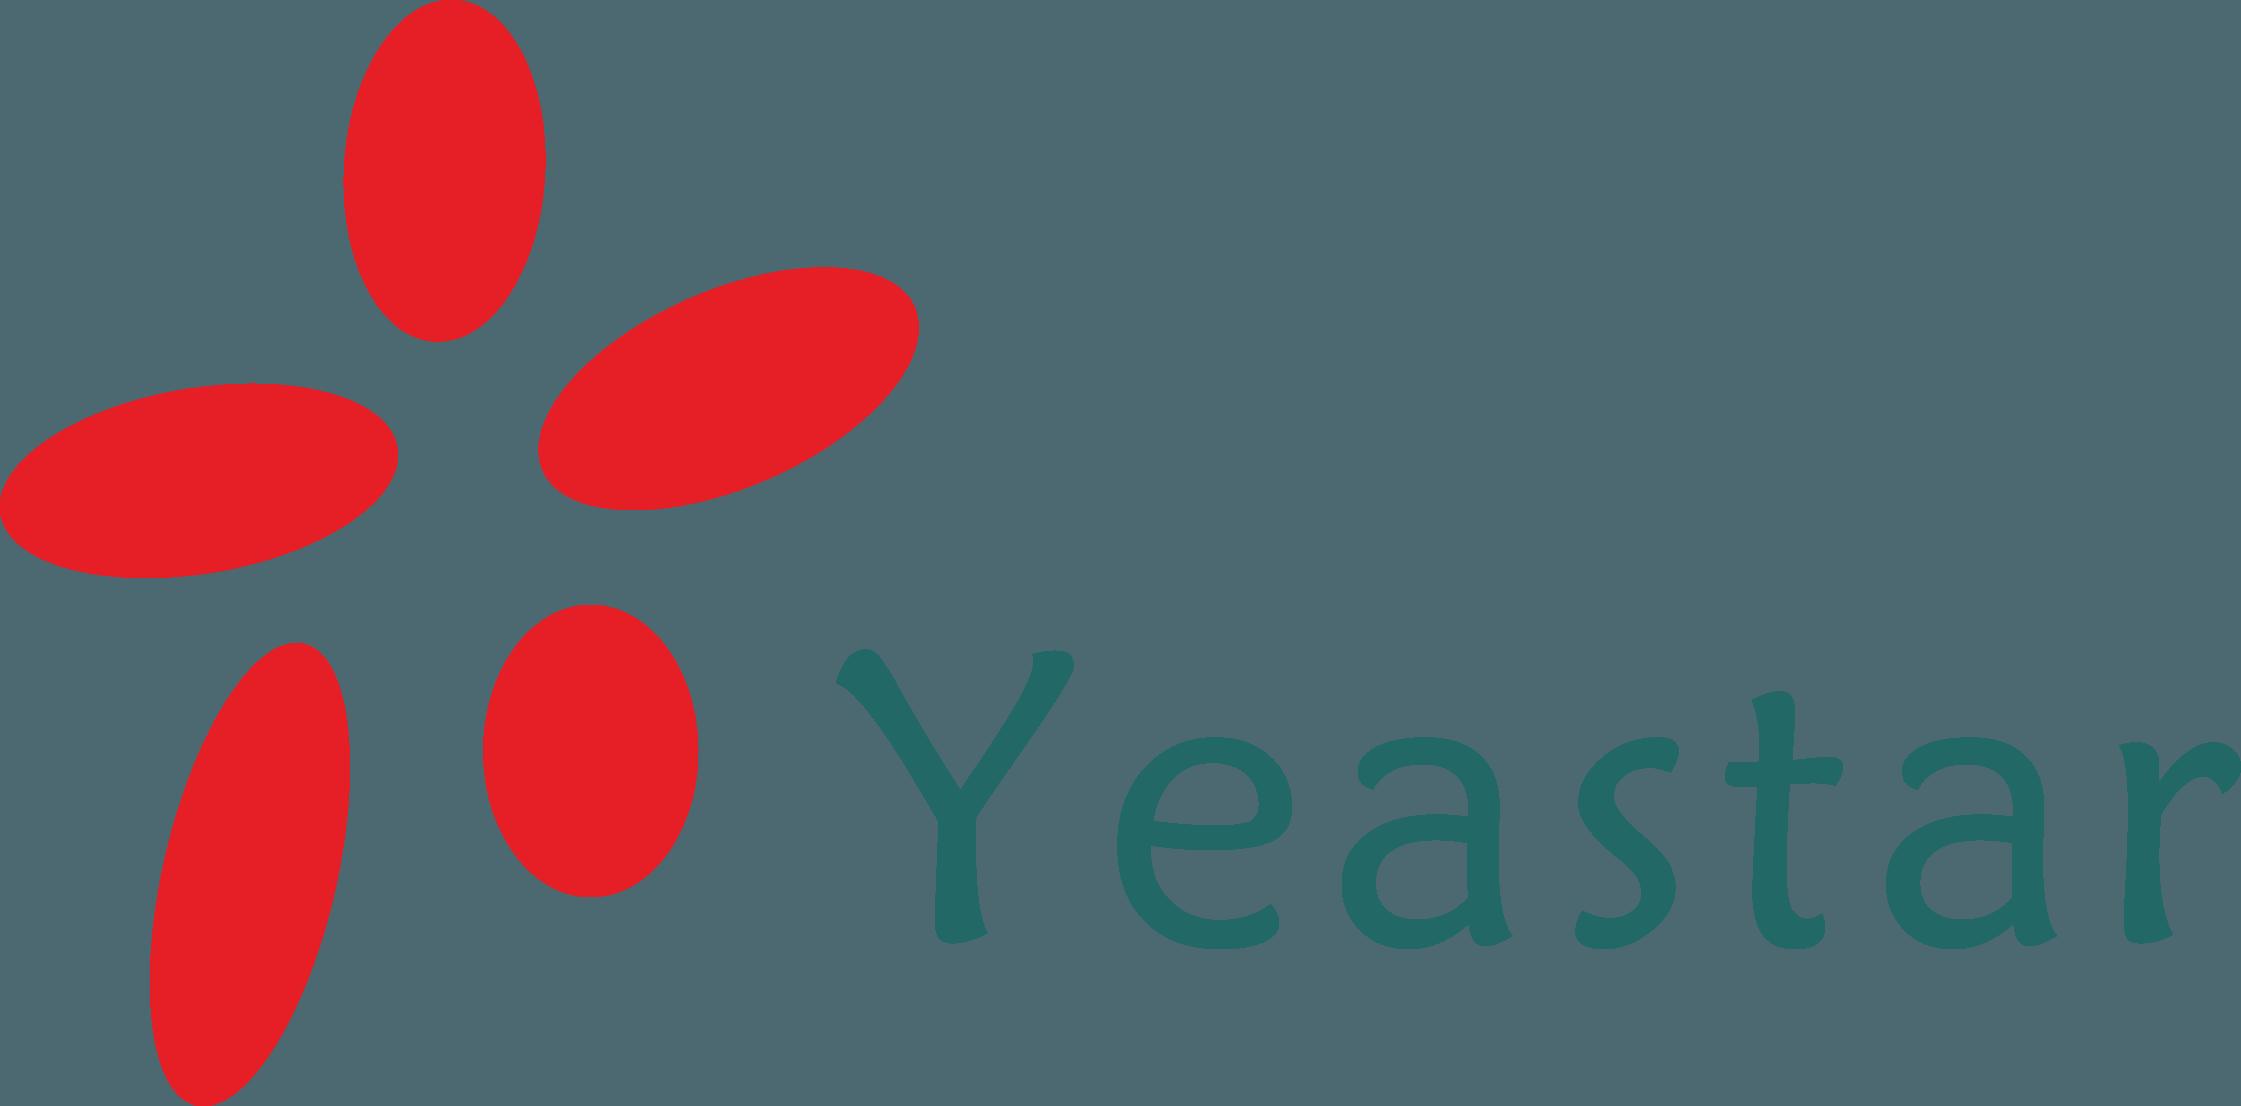 yeastar-MYPBX-DUBAI